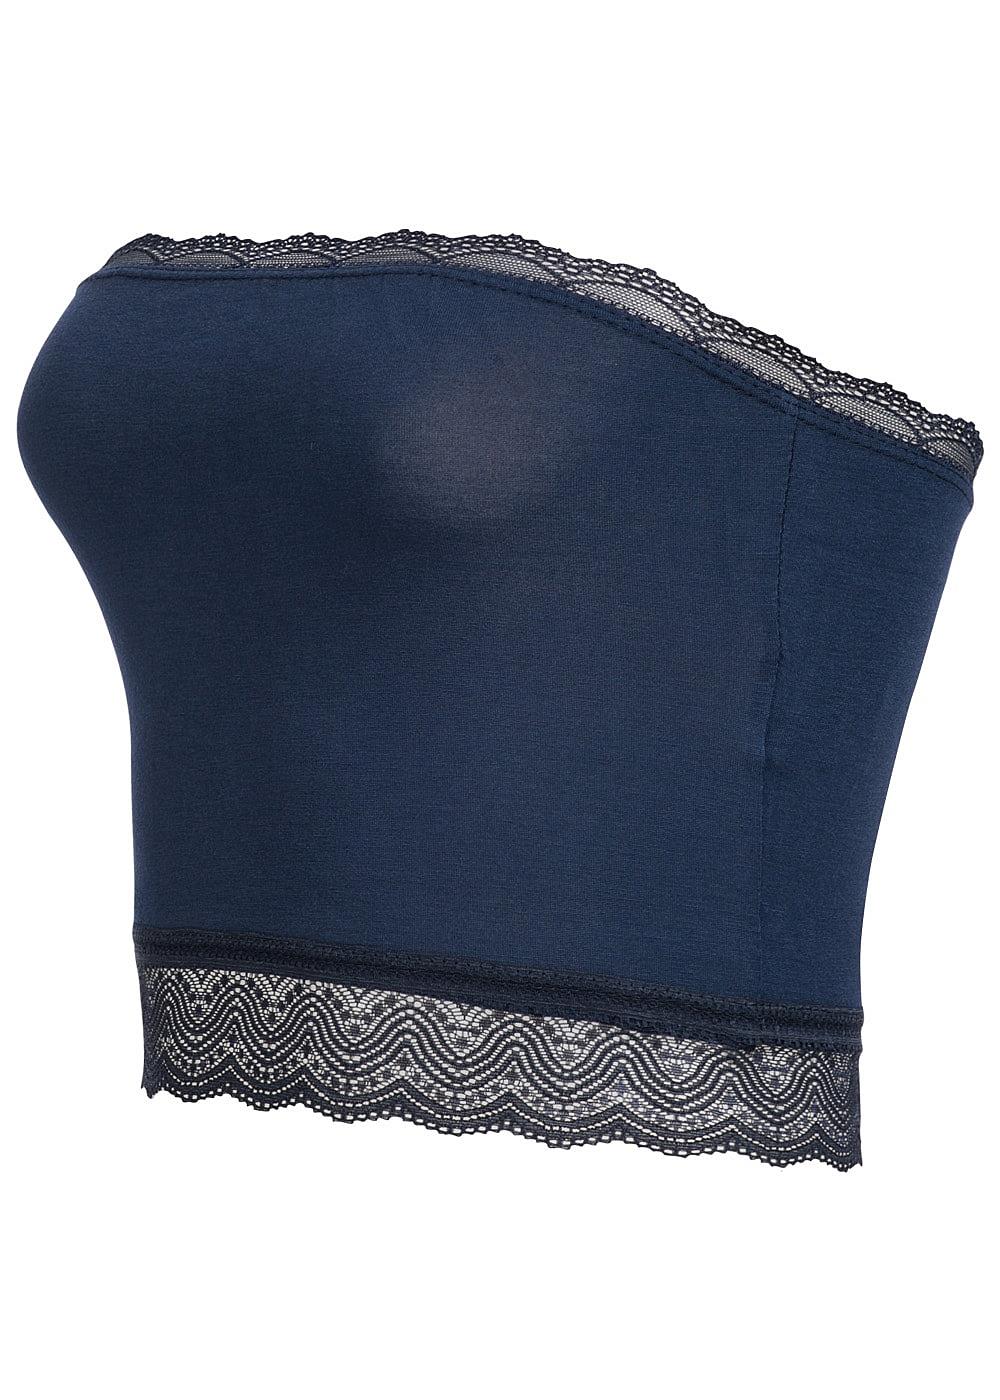 styleboom fashion damen bandeau top spitze navy blau. Black Bedroom Furniture Sets. Home Design Ideas